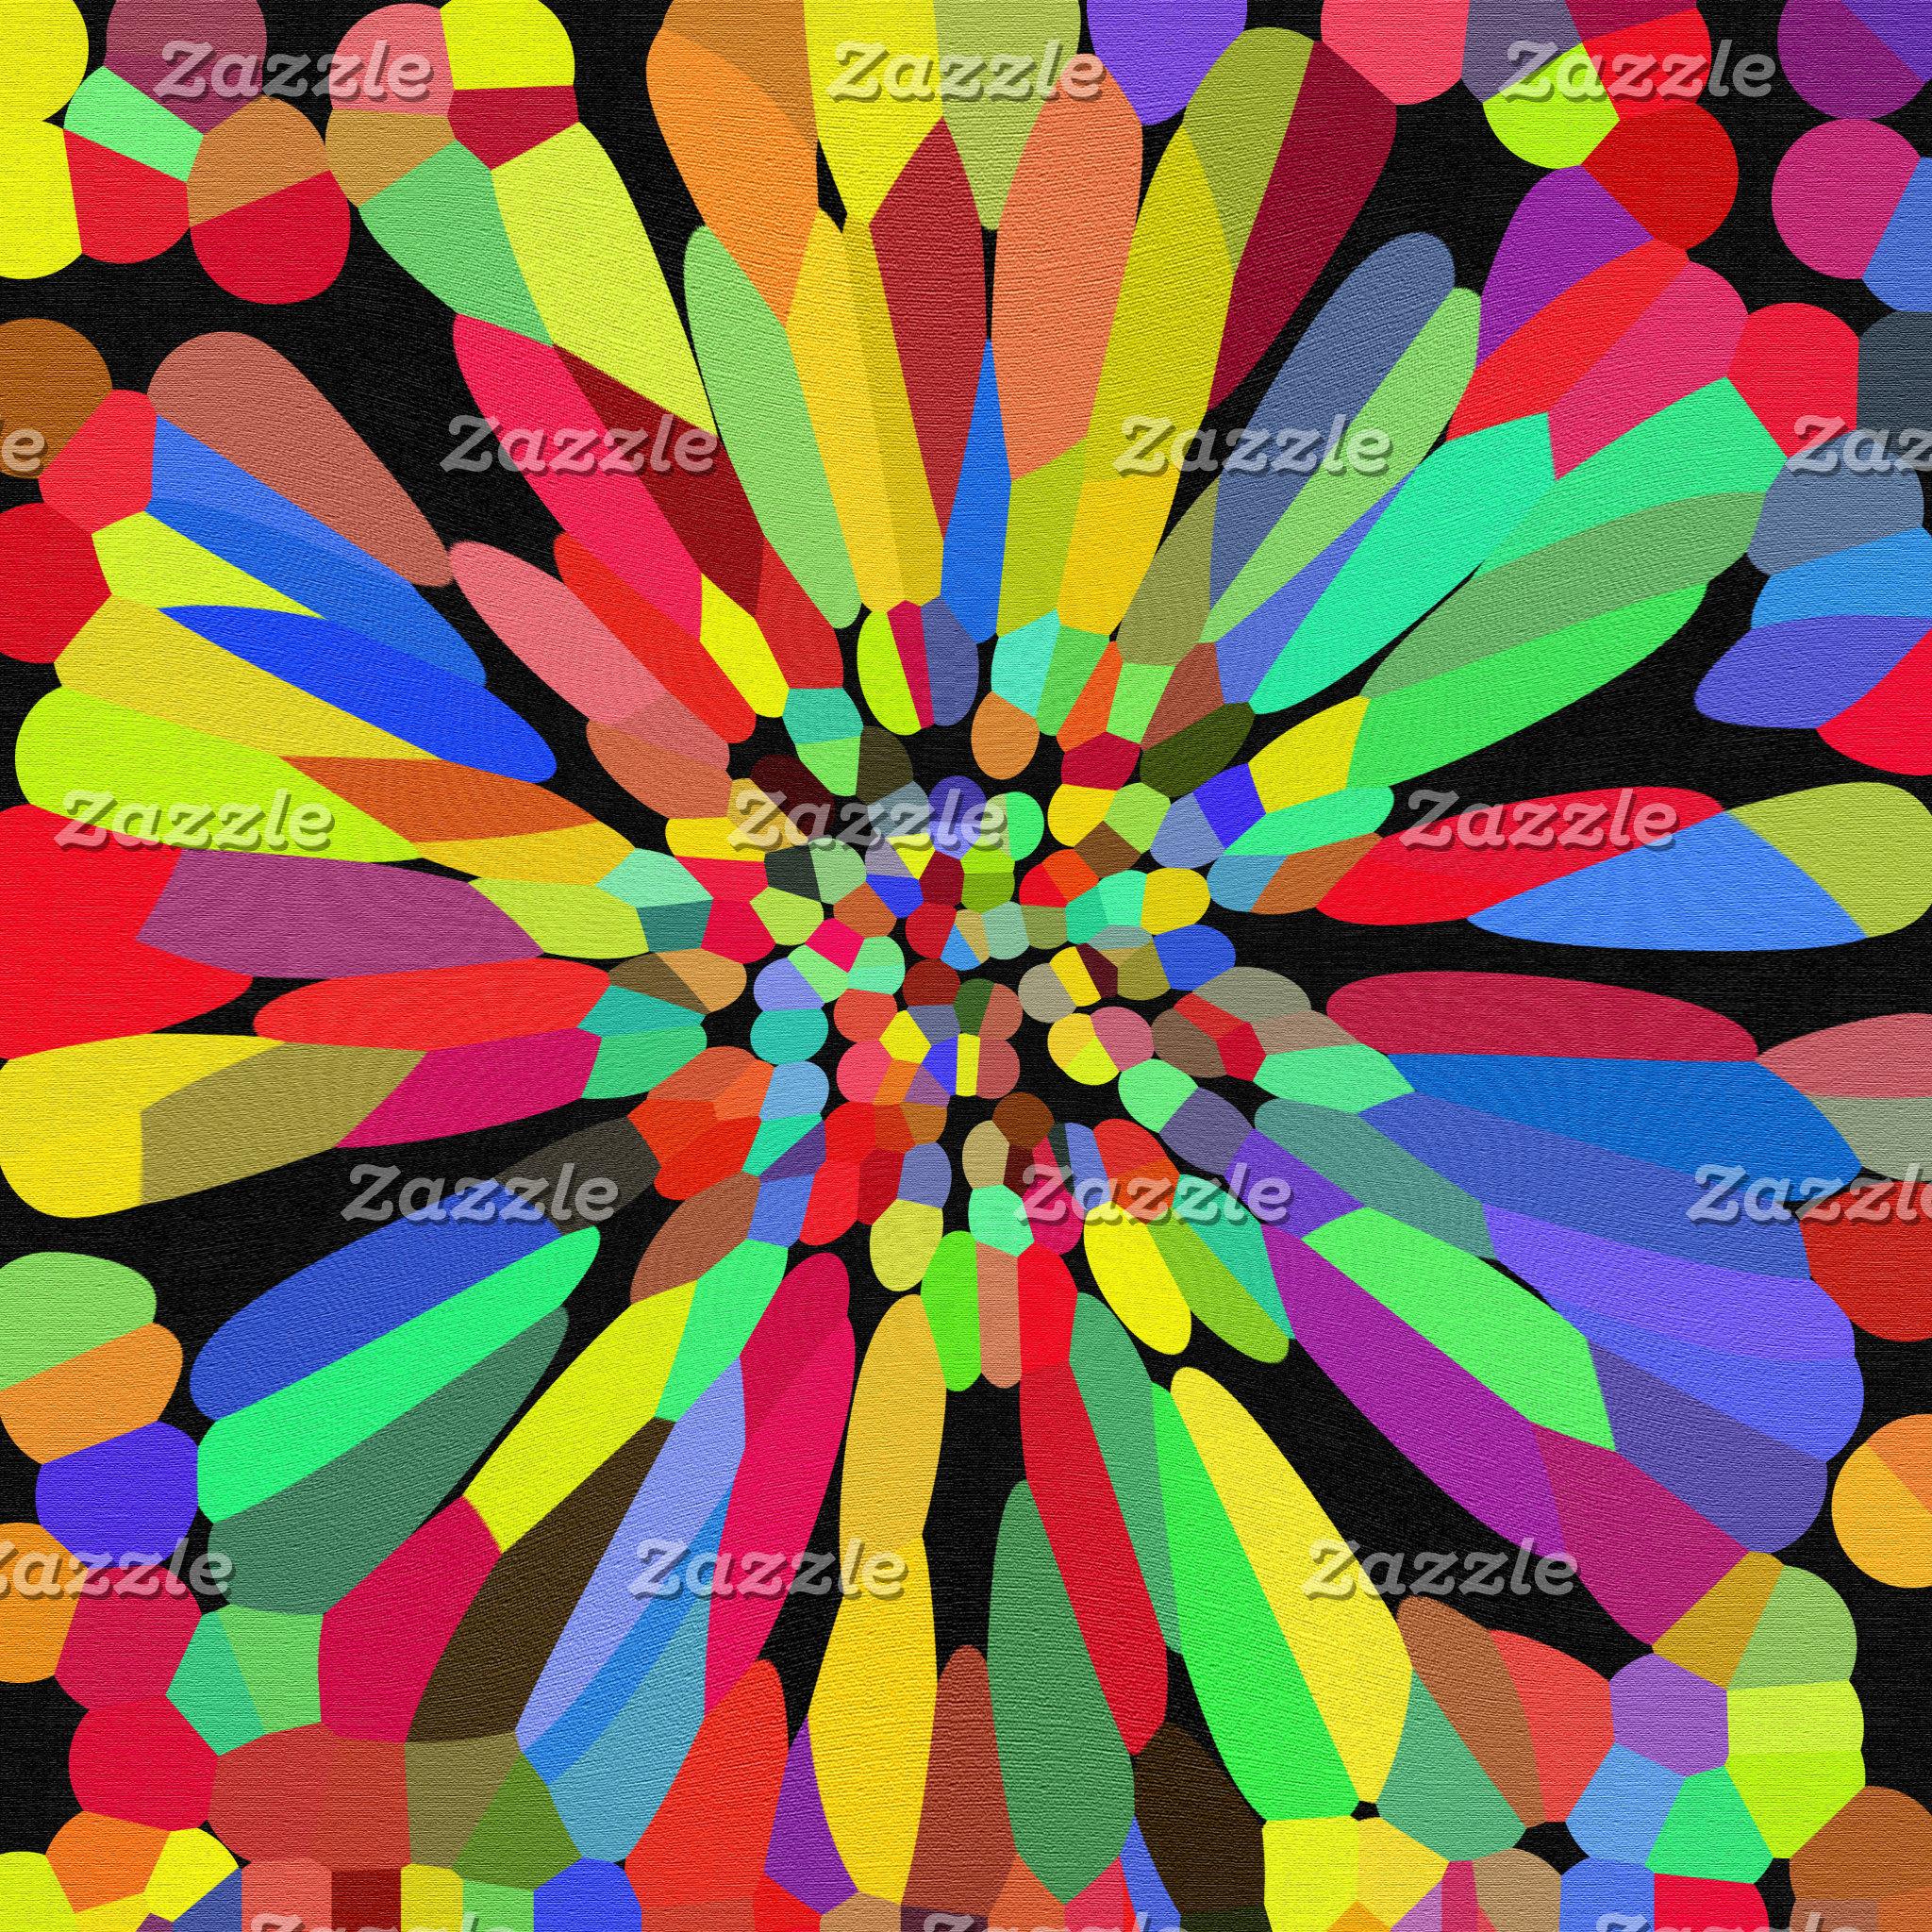 Abstract/Digital